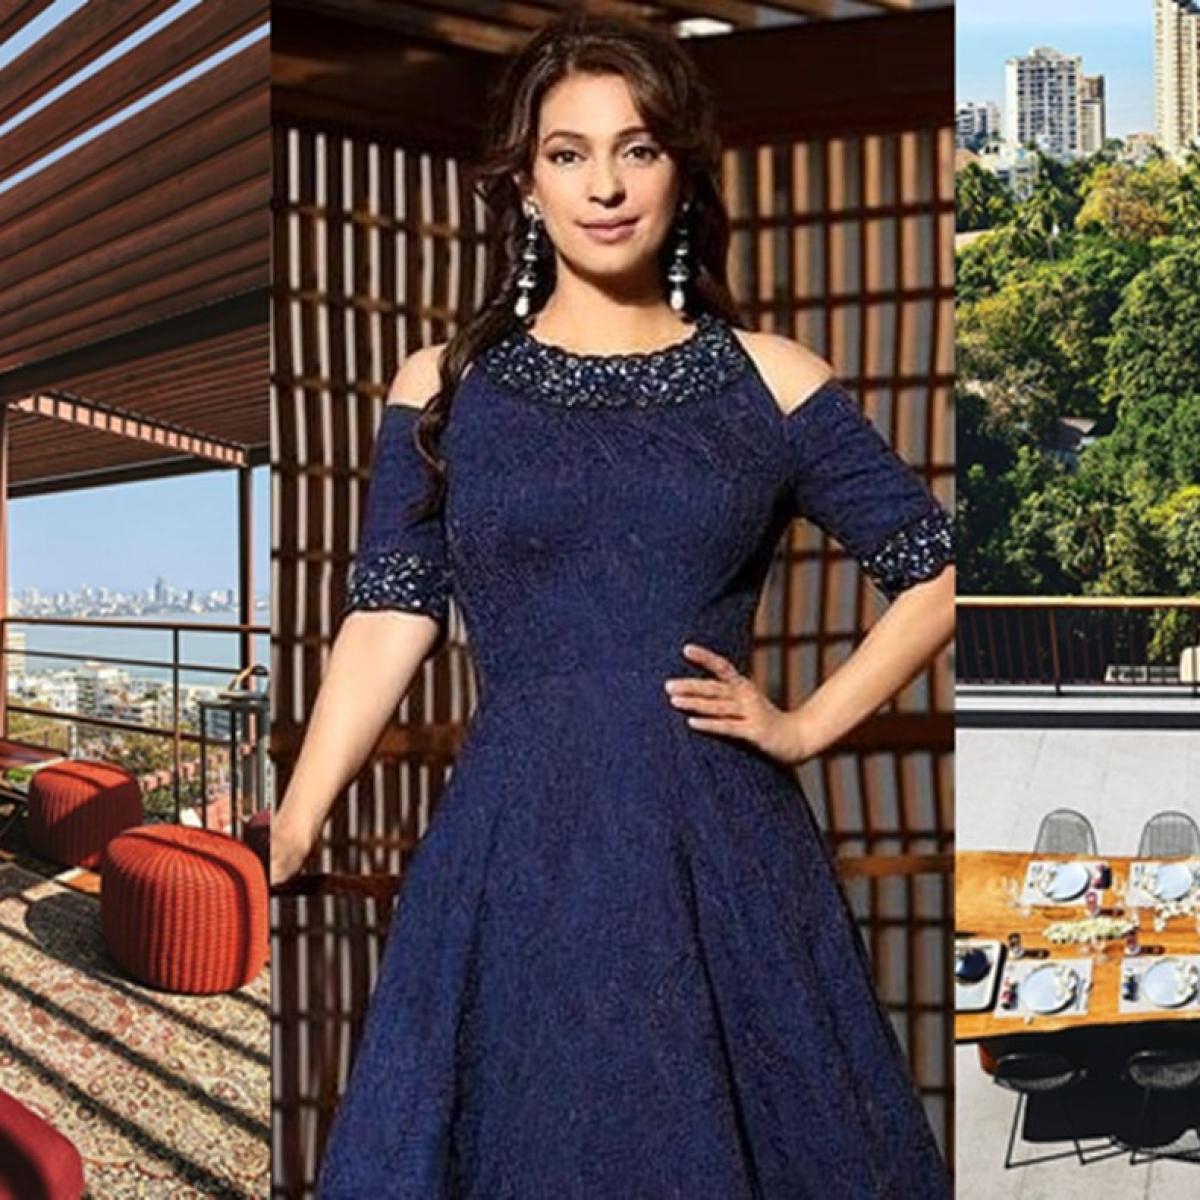 In Pics: Check out Juhi Chawla's lavish multi-storey home in Mumbai's Malabar Hill